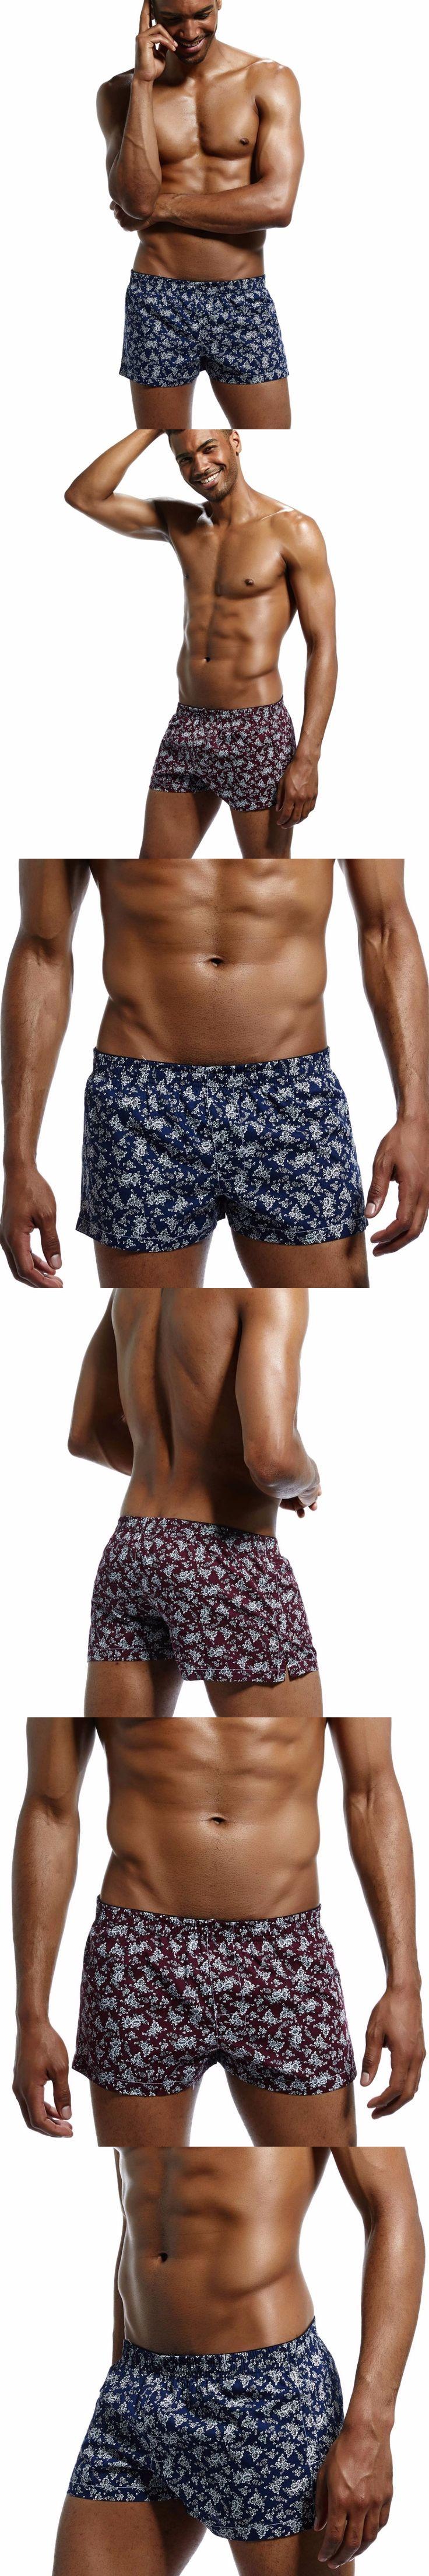 2017 new  High Quality 100% cotton underwear fashion sleep Shorts  men home Loose pants Summer Leisur cotton shorts plus size